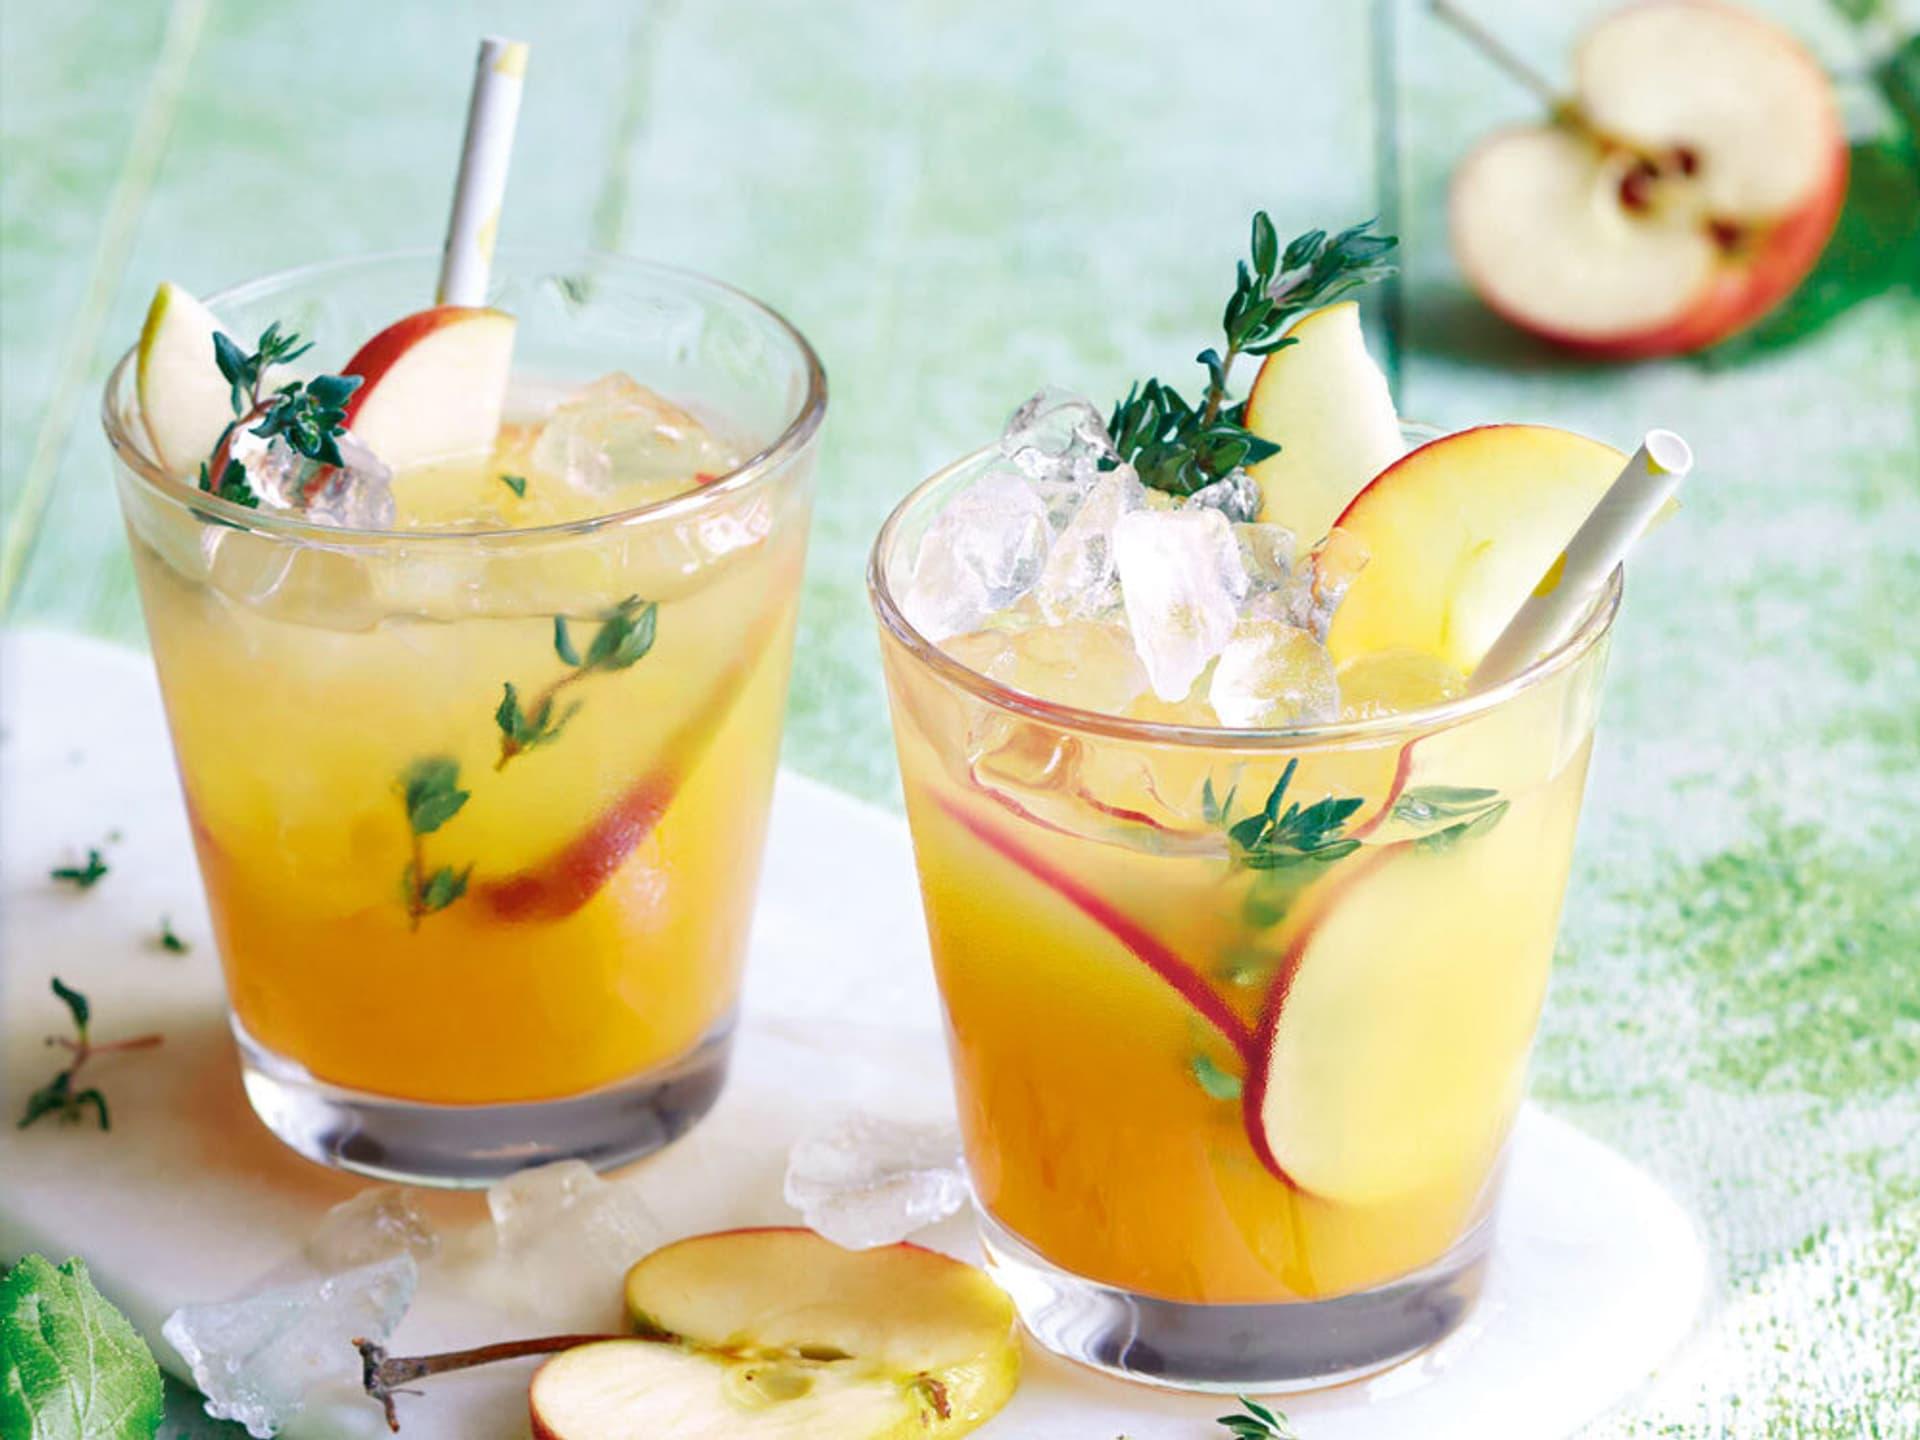 Apfel sanddorn spritz